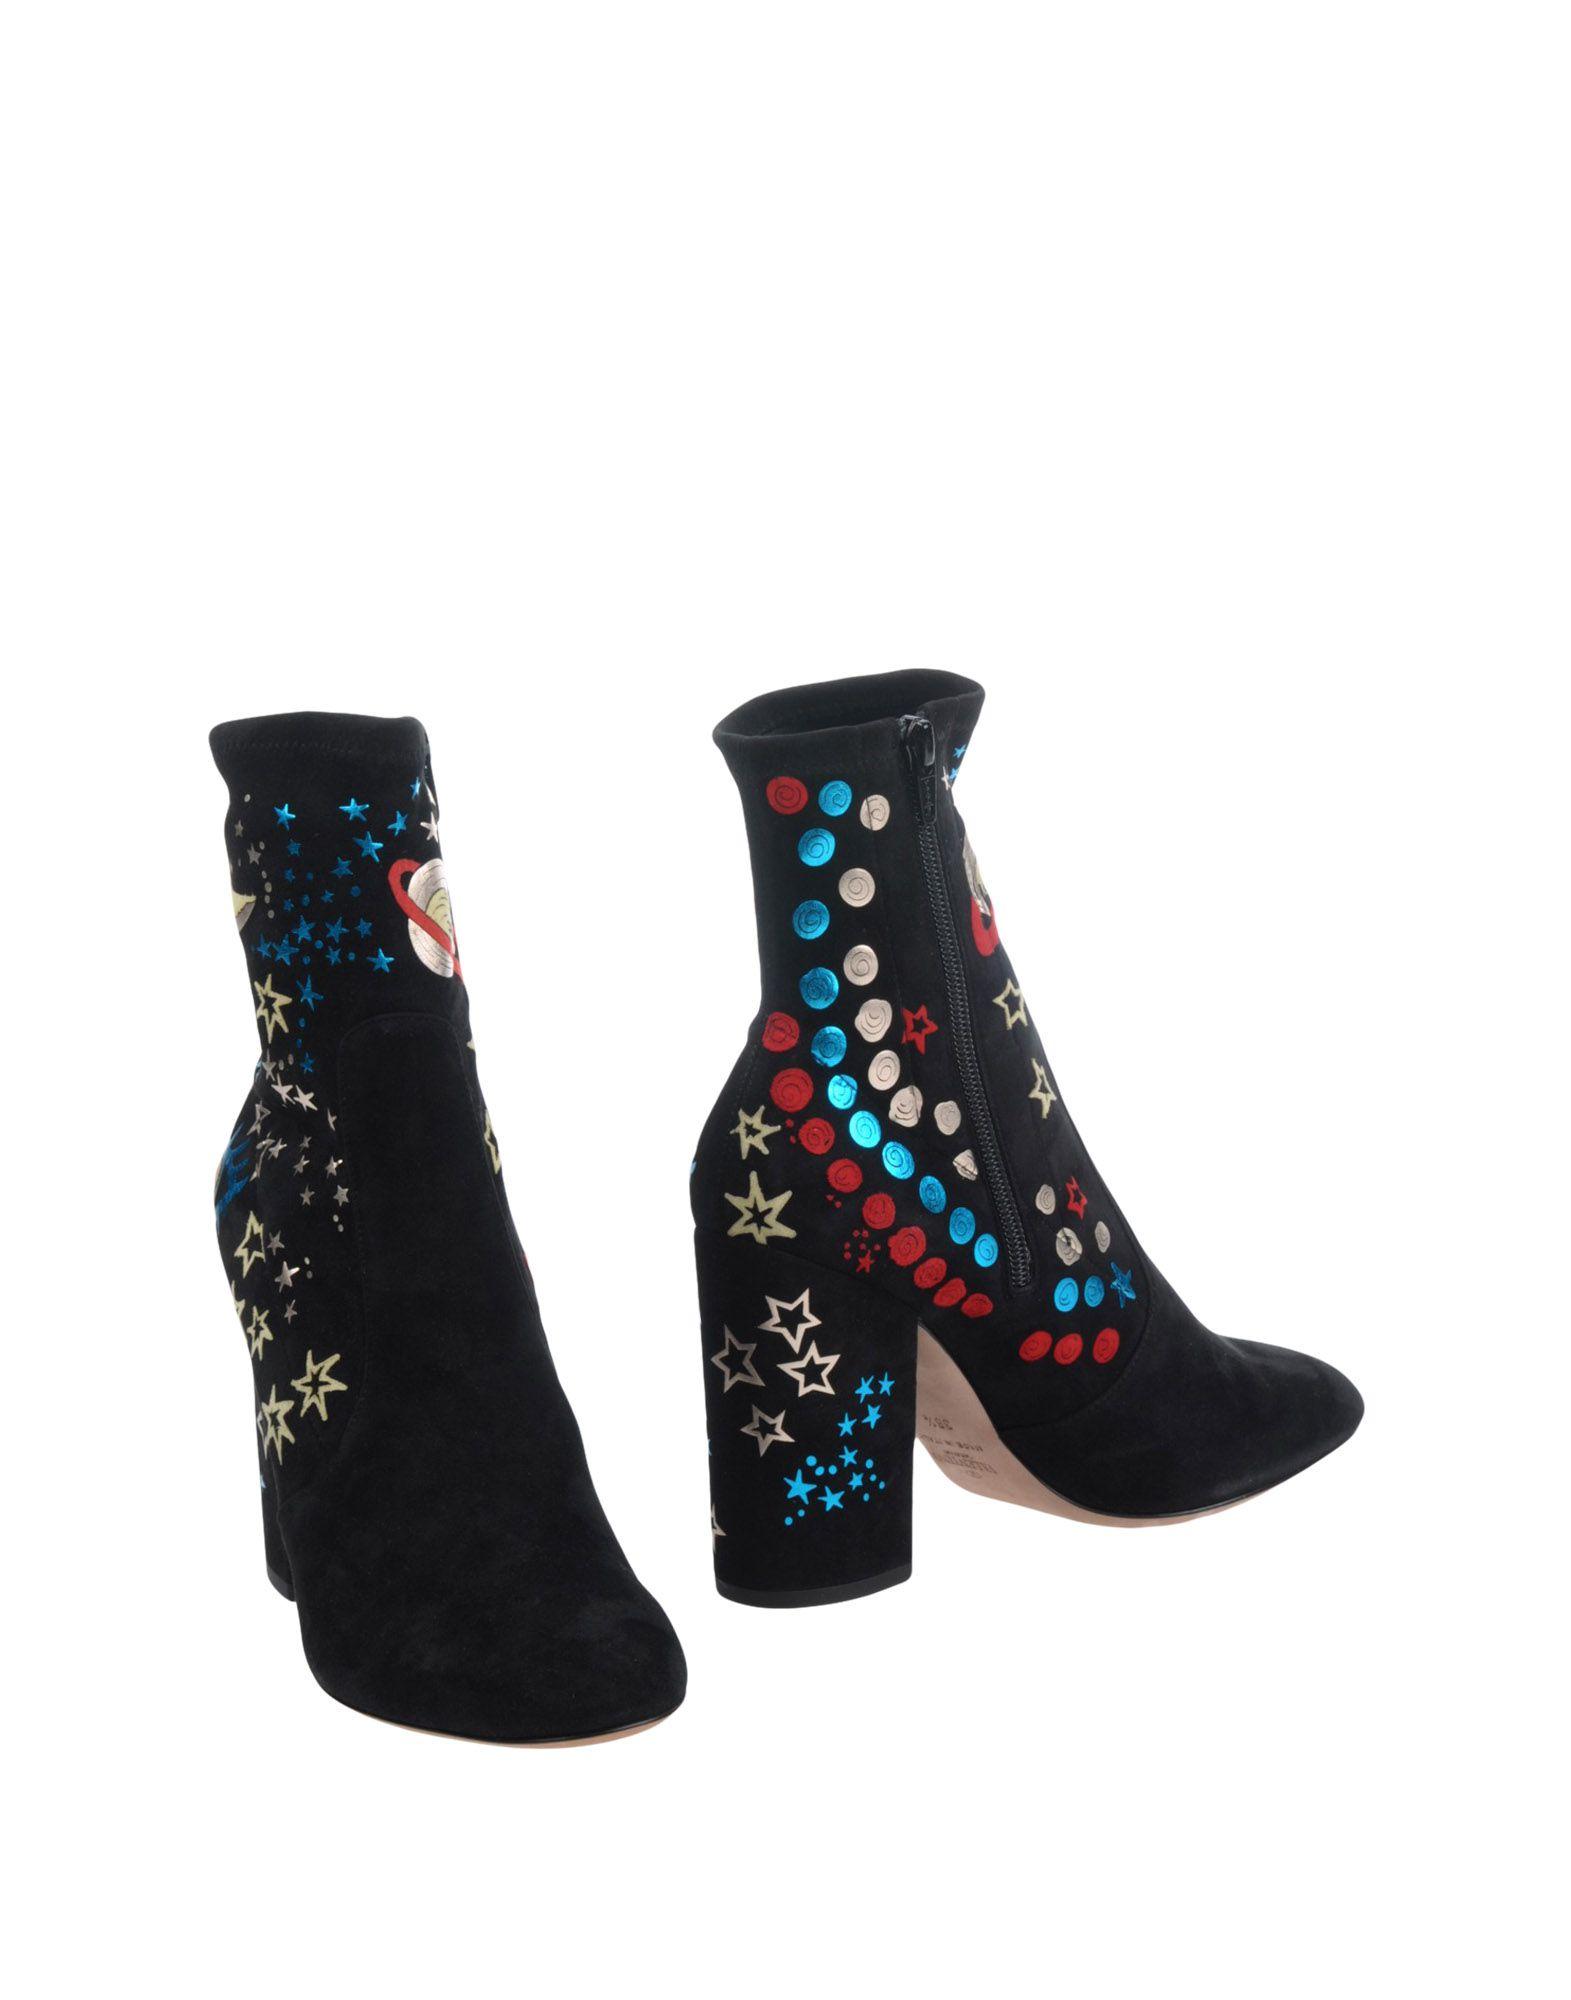 Valentino Garavani Ankle Boot - Women Valentino Garavani Ankle Australia Boots online on  Australia Ankle - 11276813MB 3c31f7